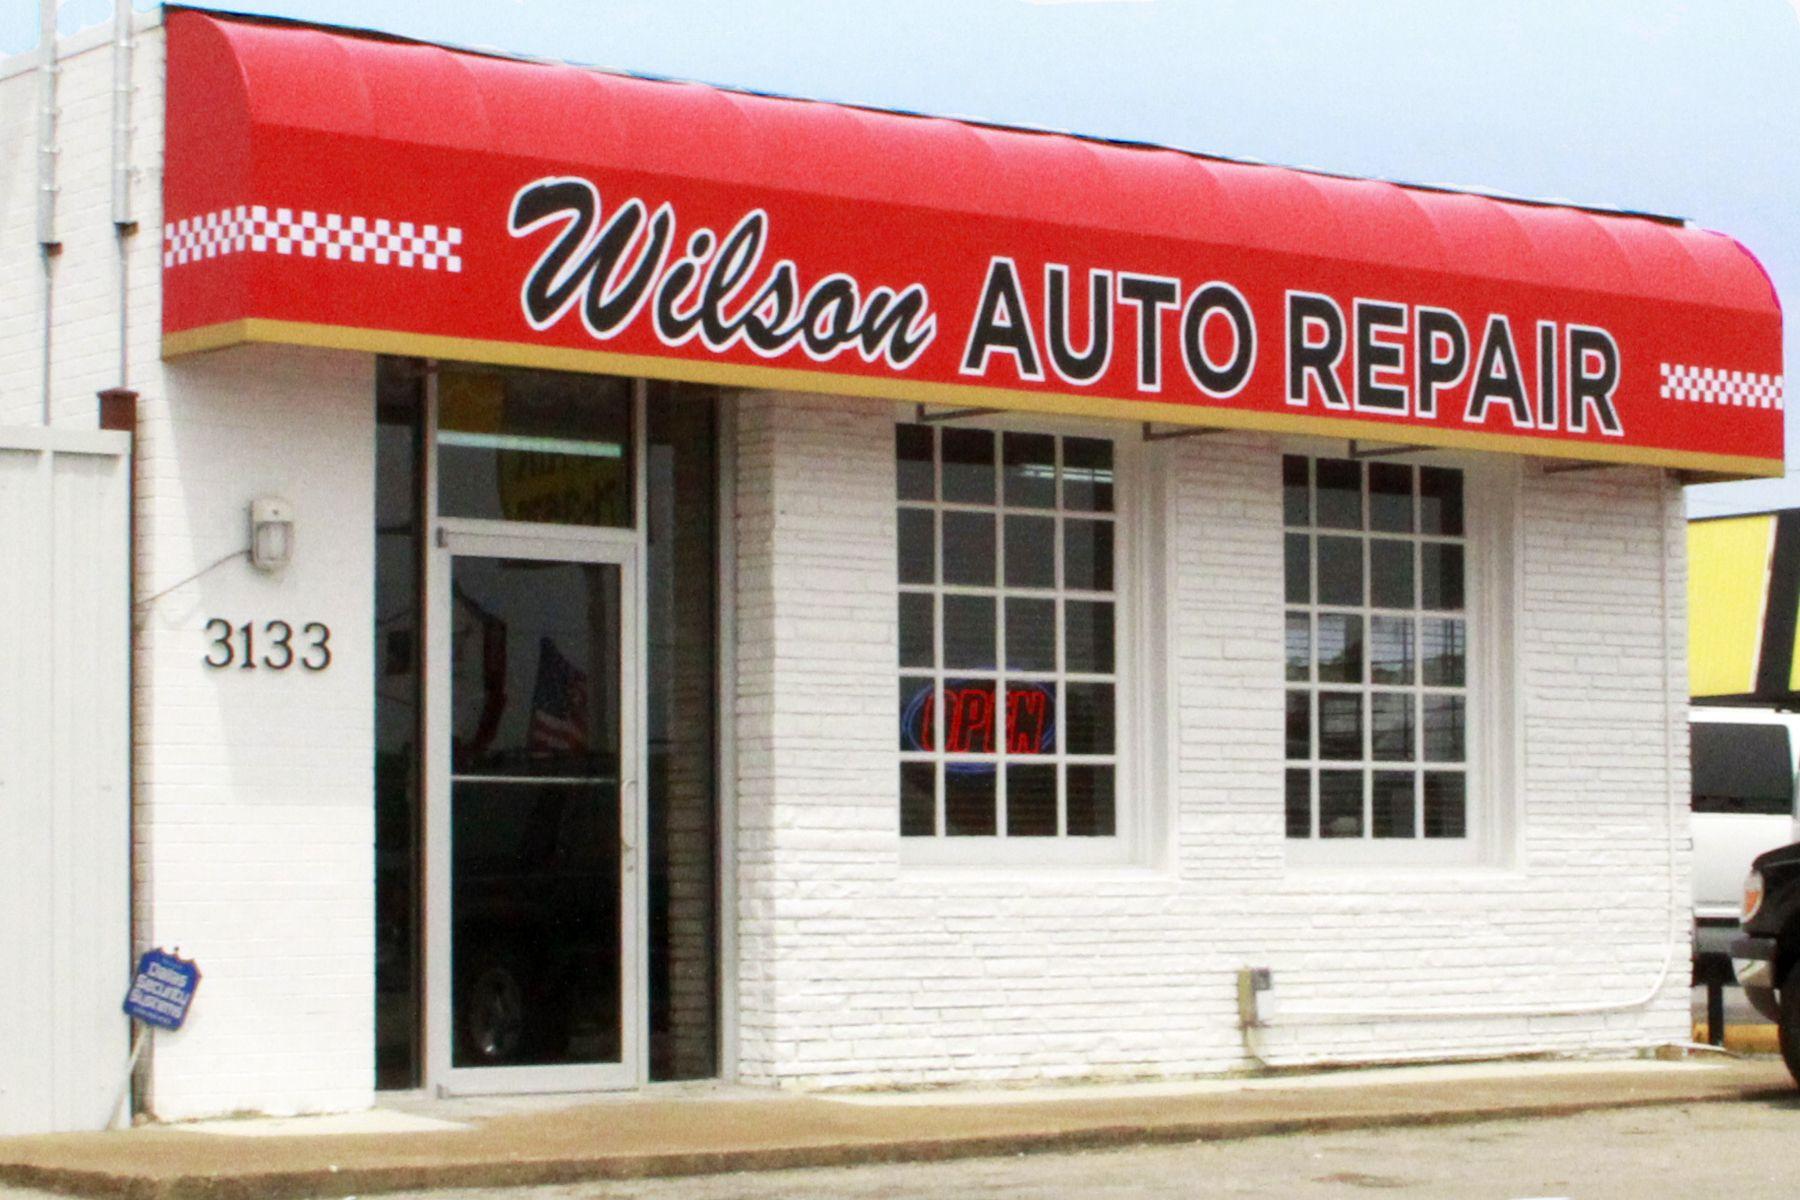 Wilson Auto Repair is a classic car restoration shop in